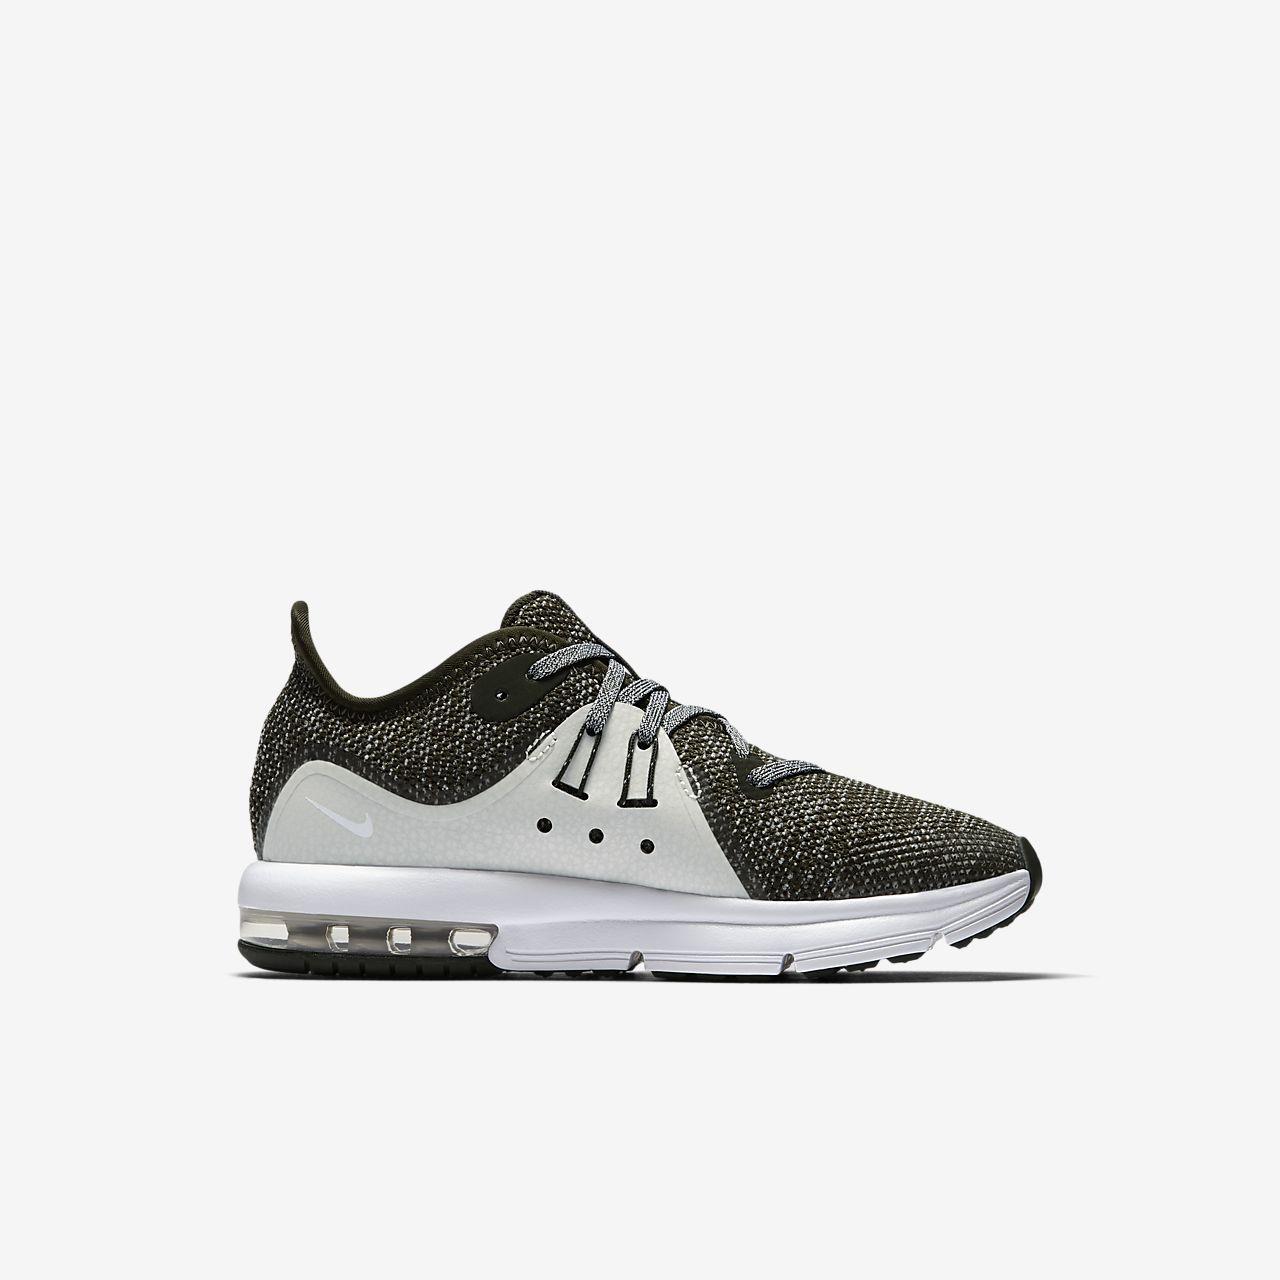 Chaussures Nike Air Max Sequent argentées garçon jHOTYfGf4